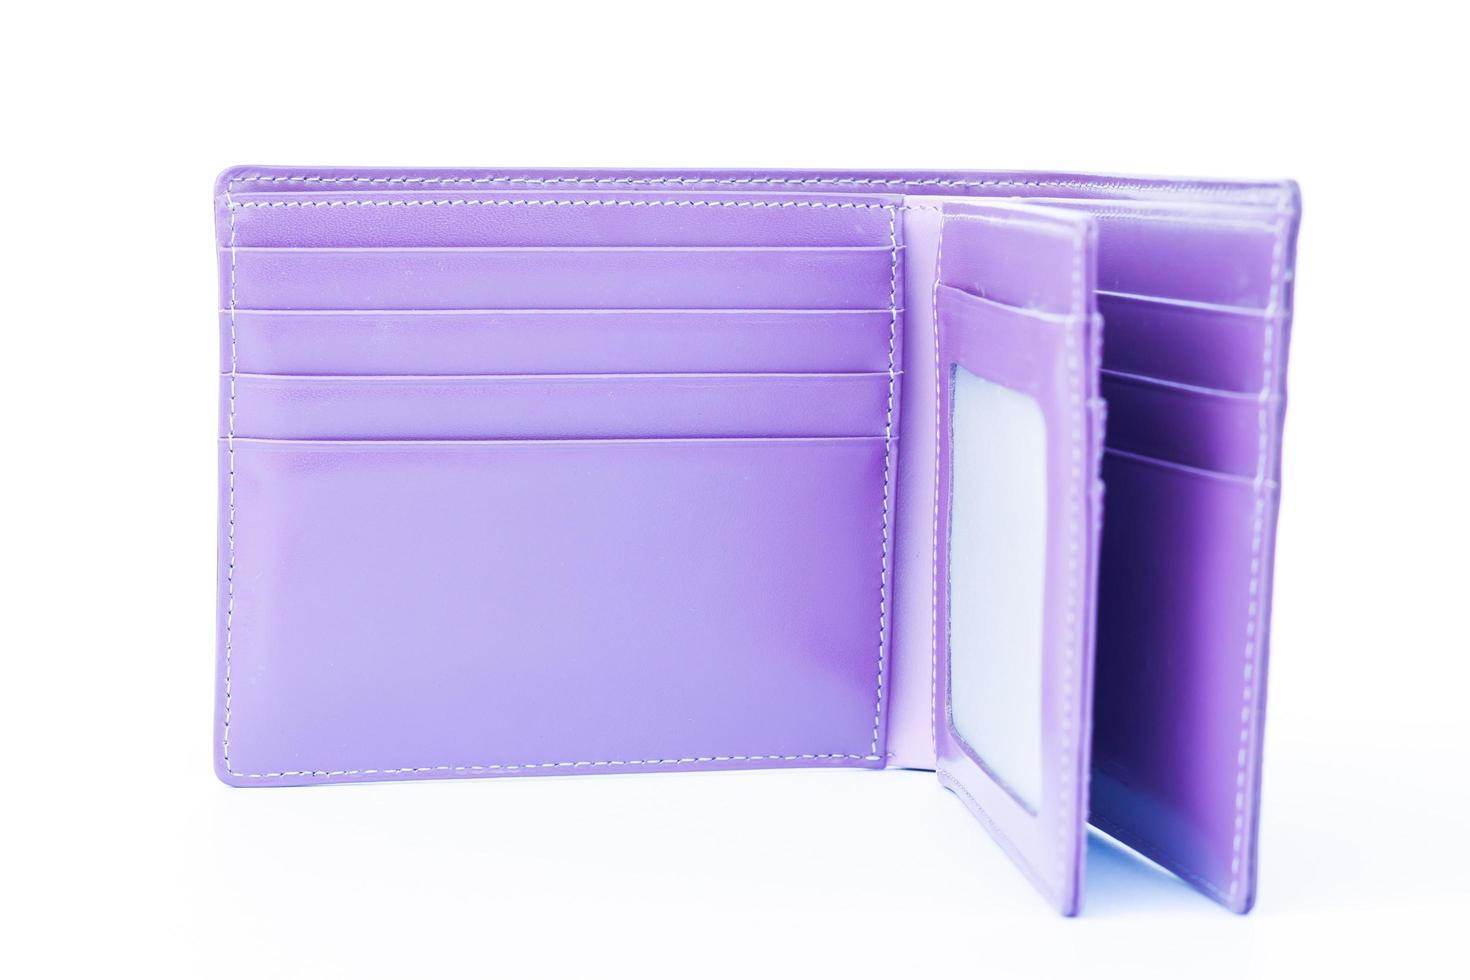 paarse lederen portemonnee foto